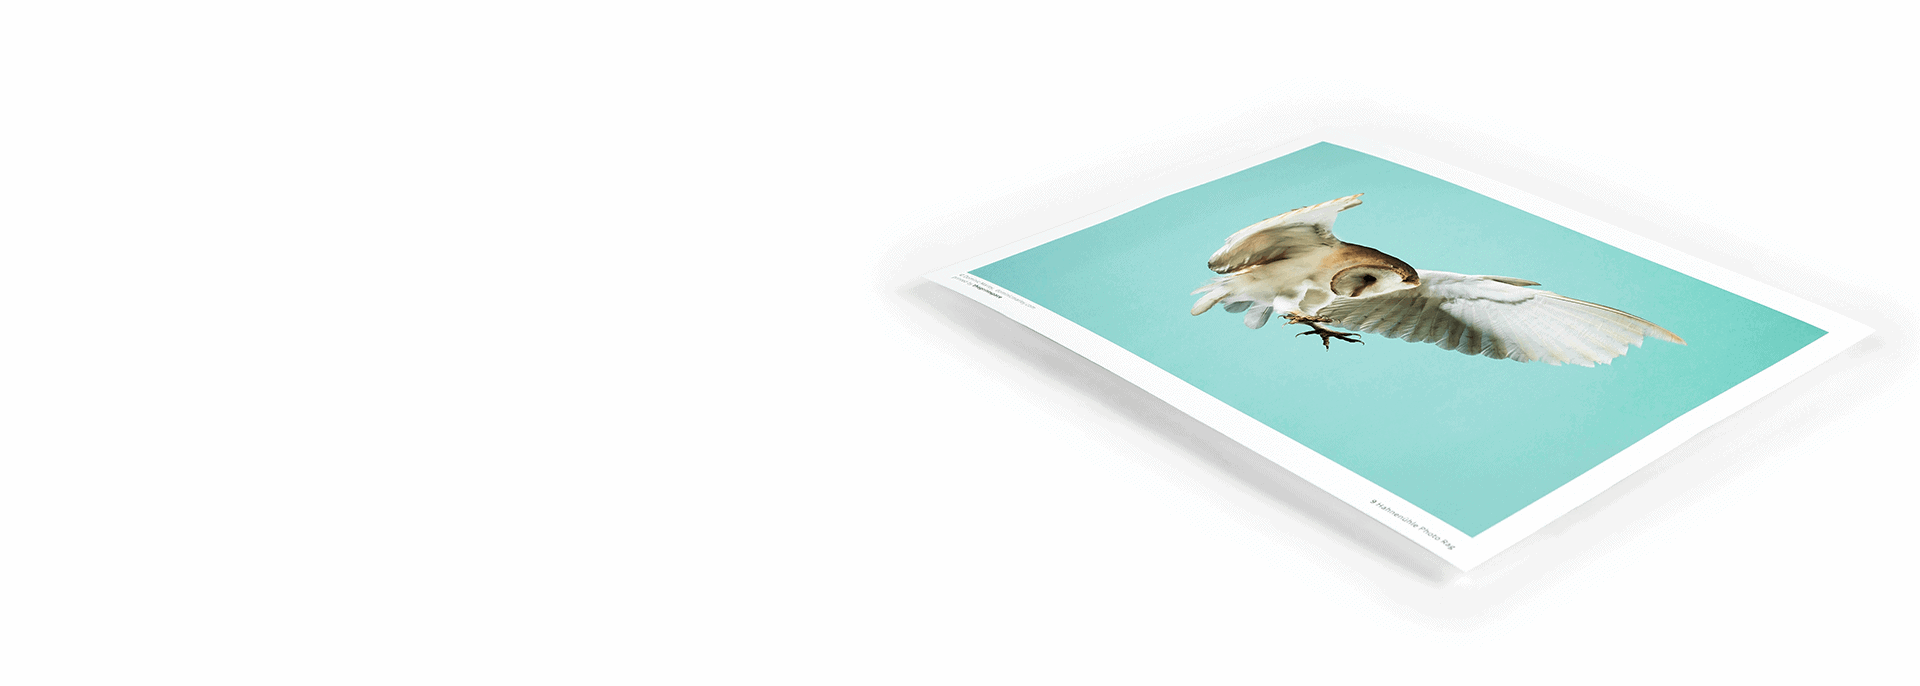 giclée printing service theprintspace